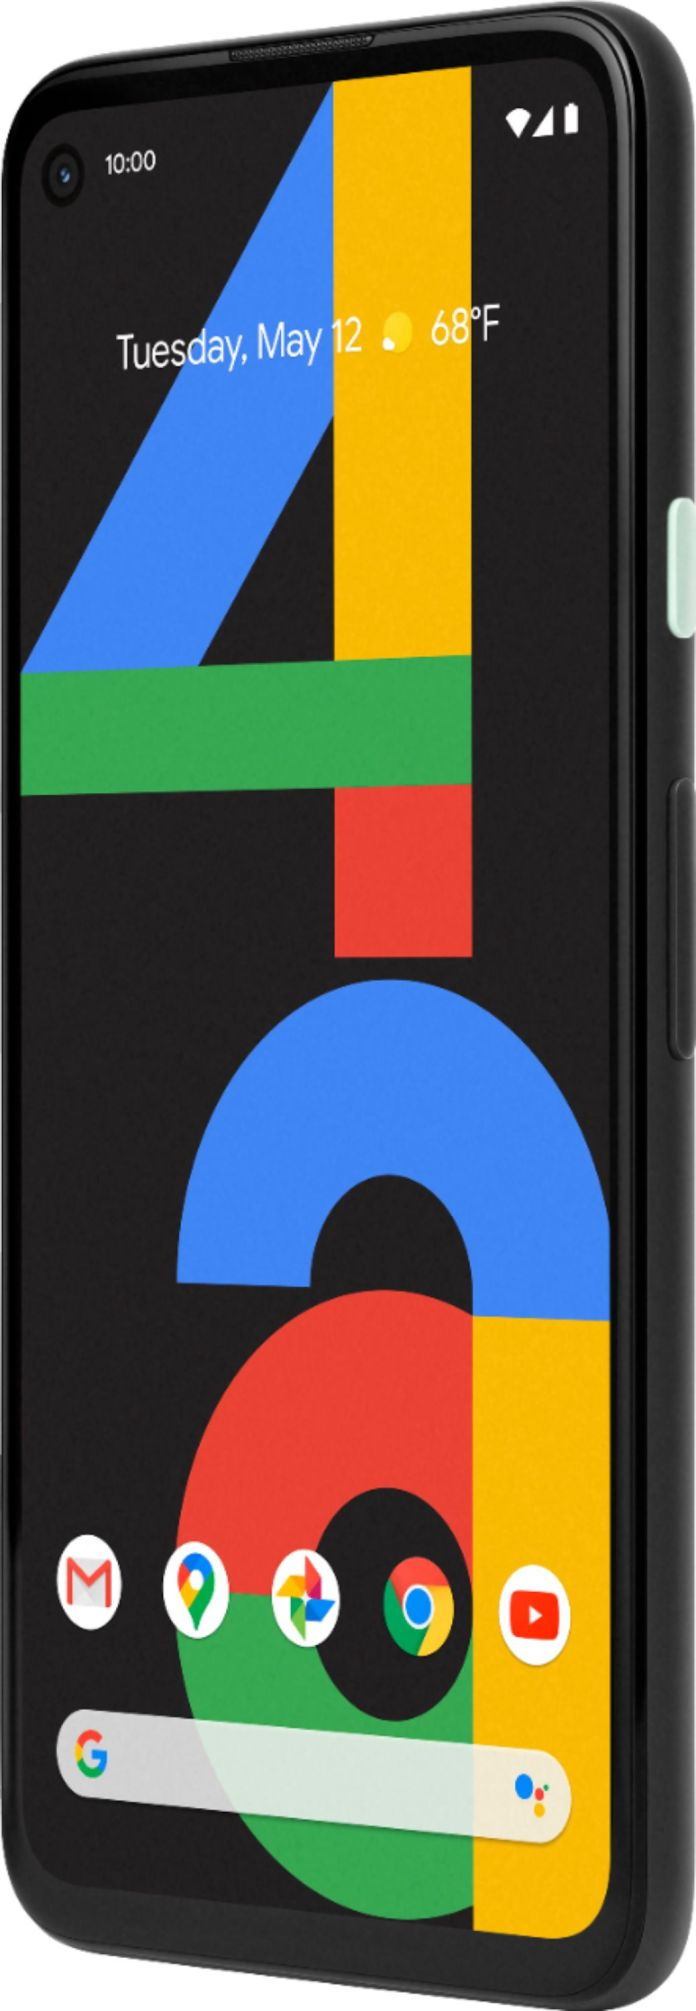 Google Pixel 4a 128gb Unlocked Just Black Ga02099 Us Best Buy